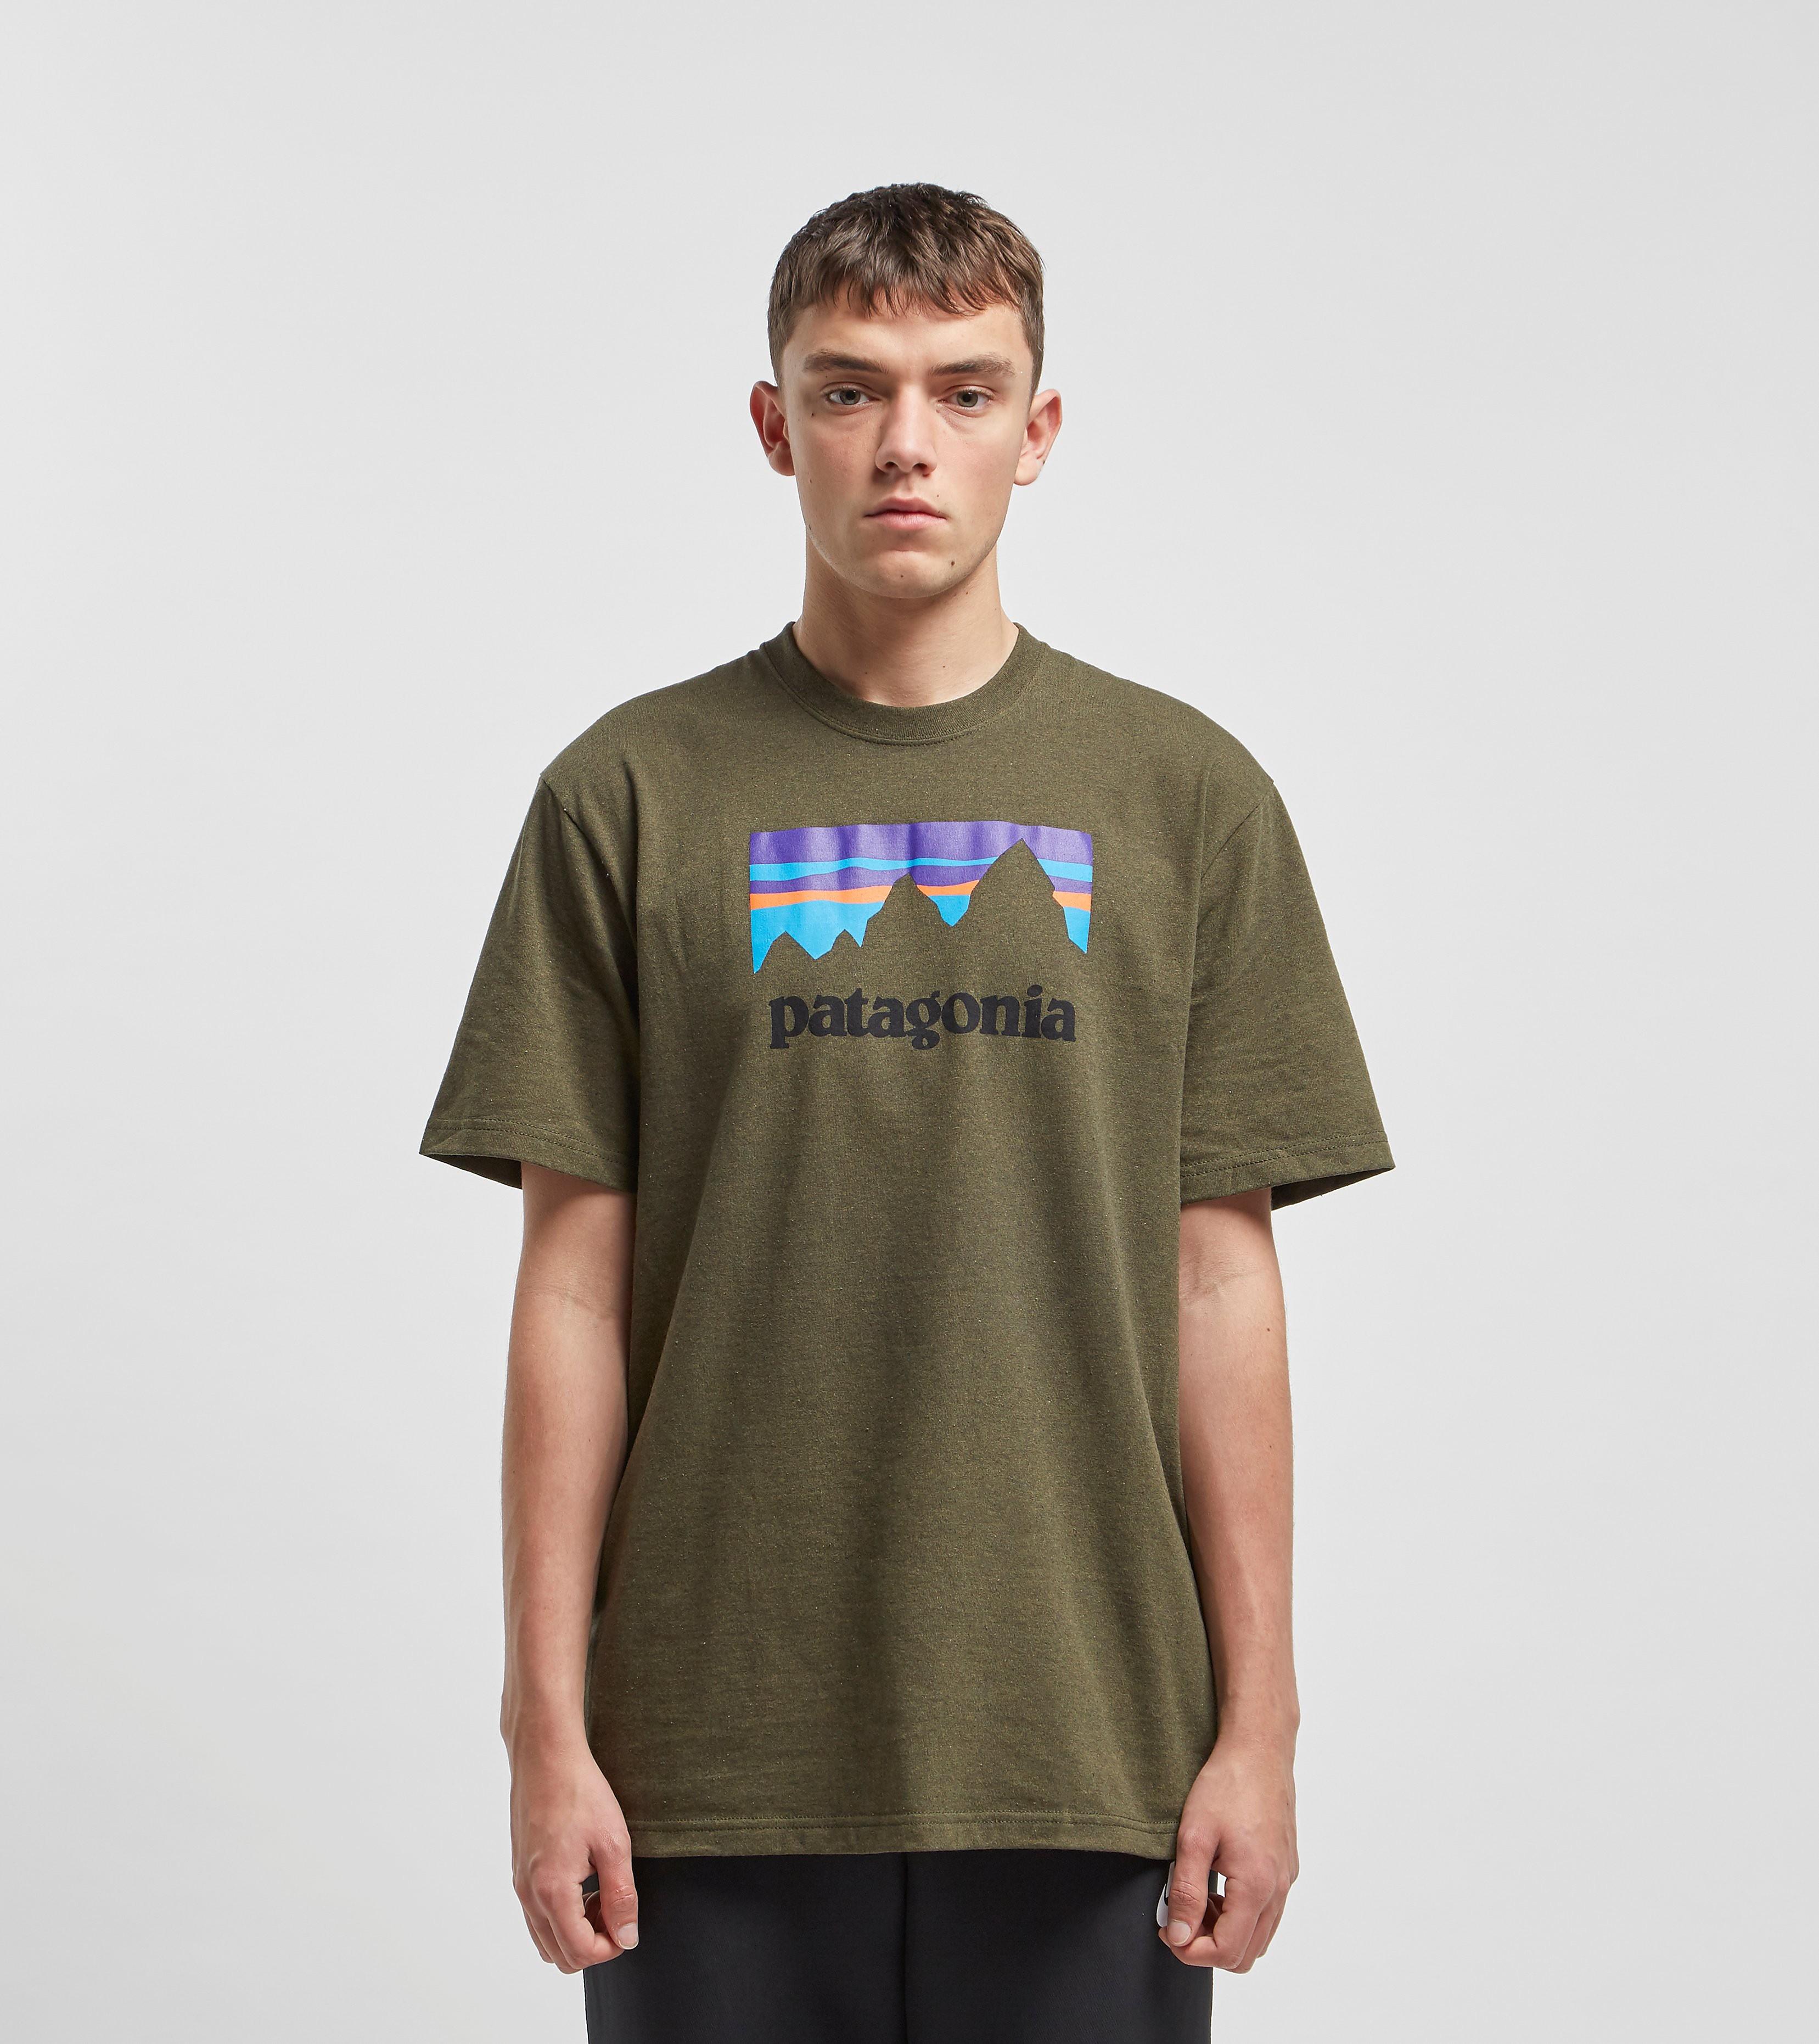 Patagonia Shop Sticker T-Shirt, Groen